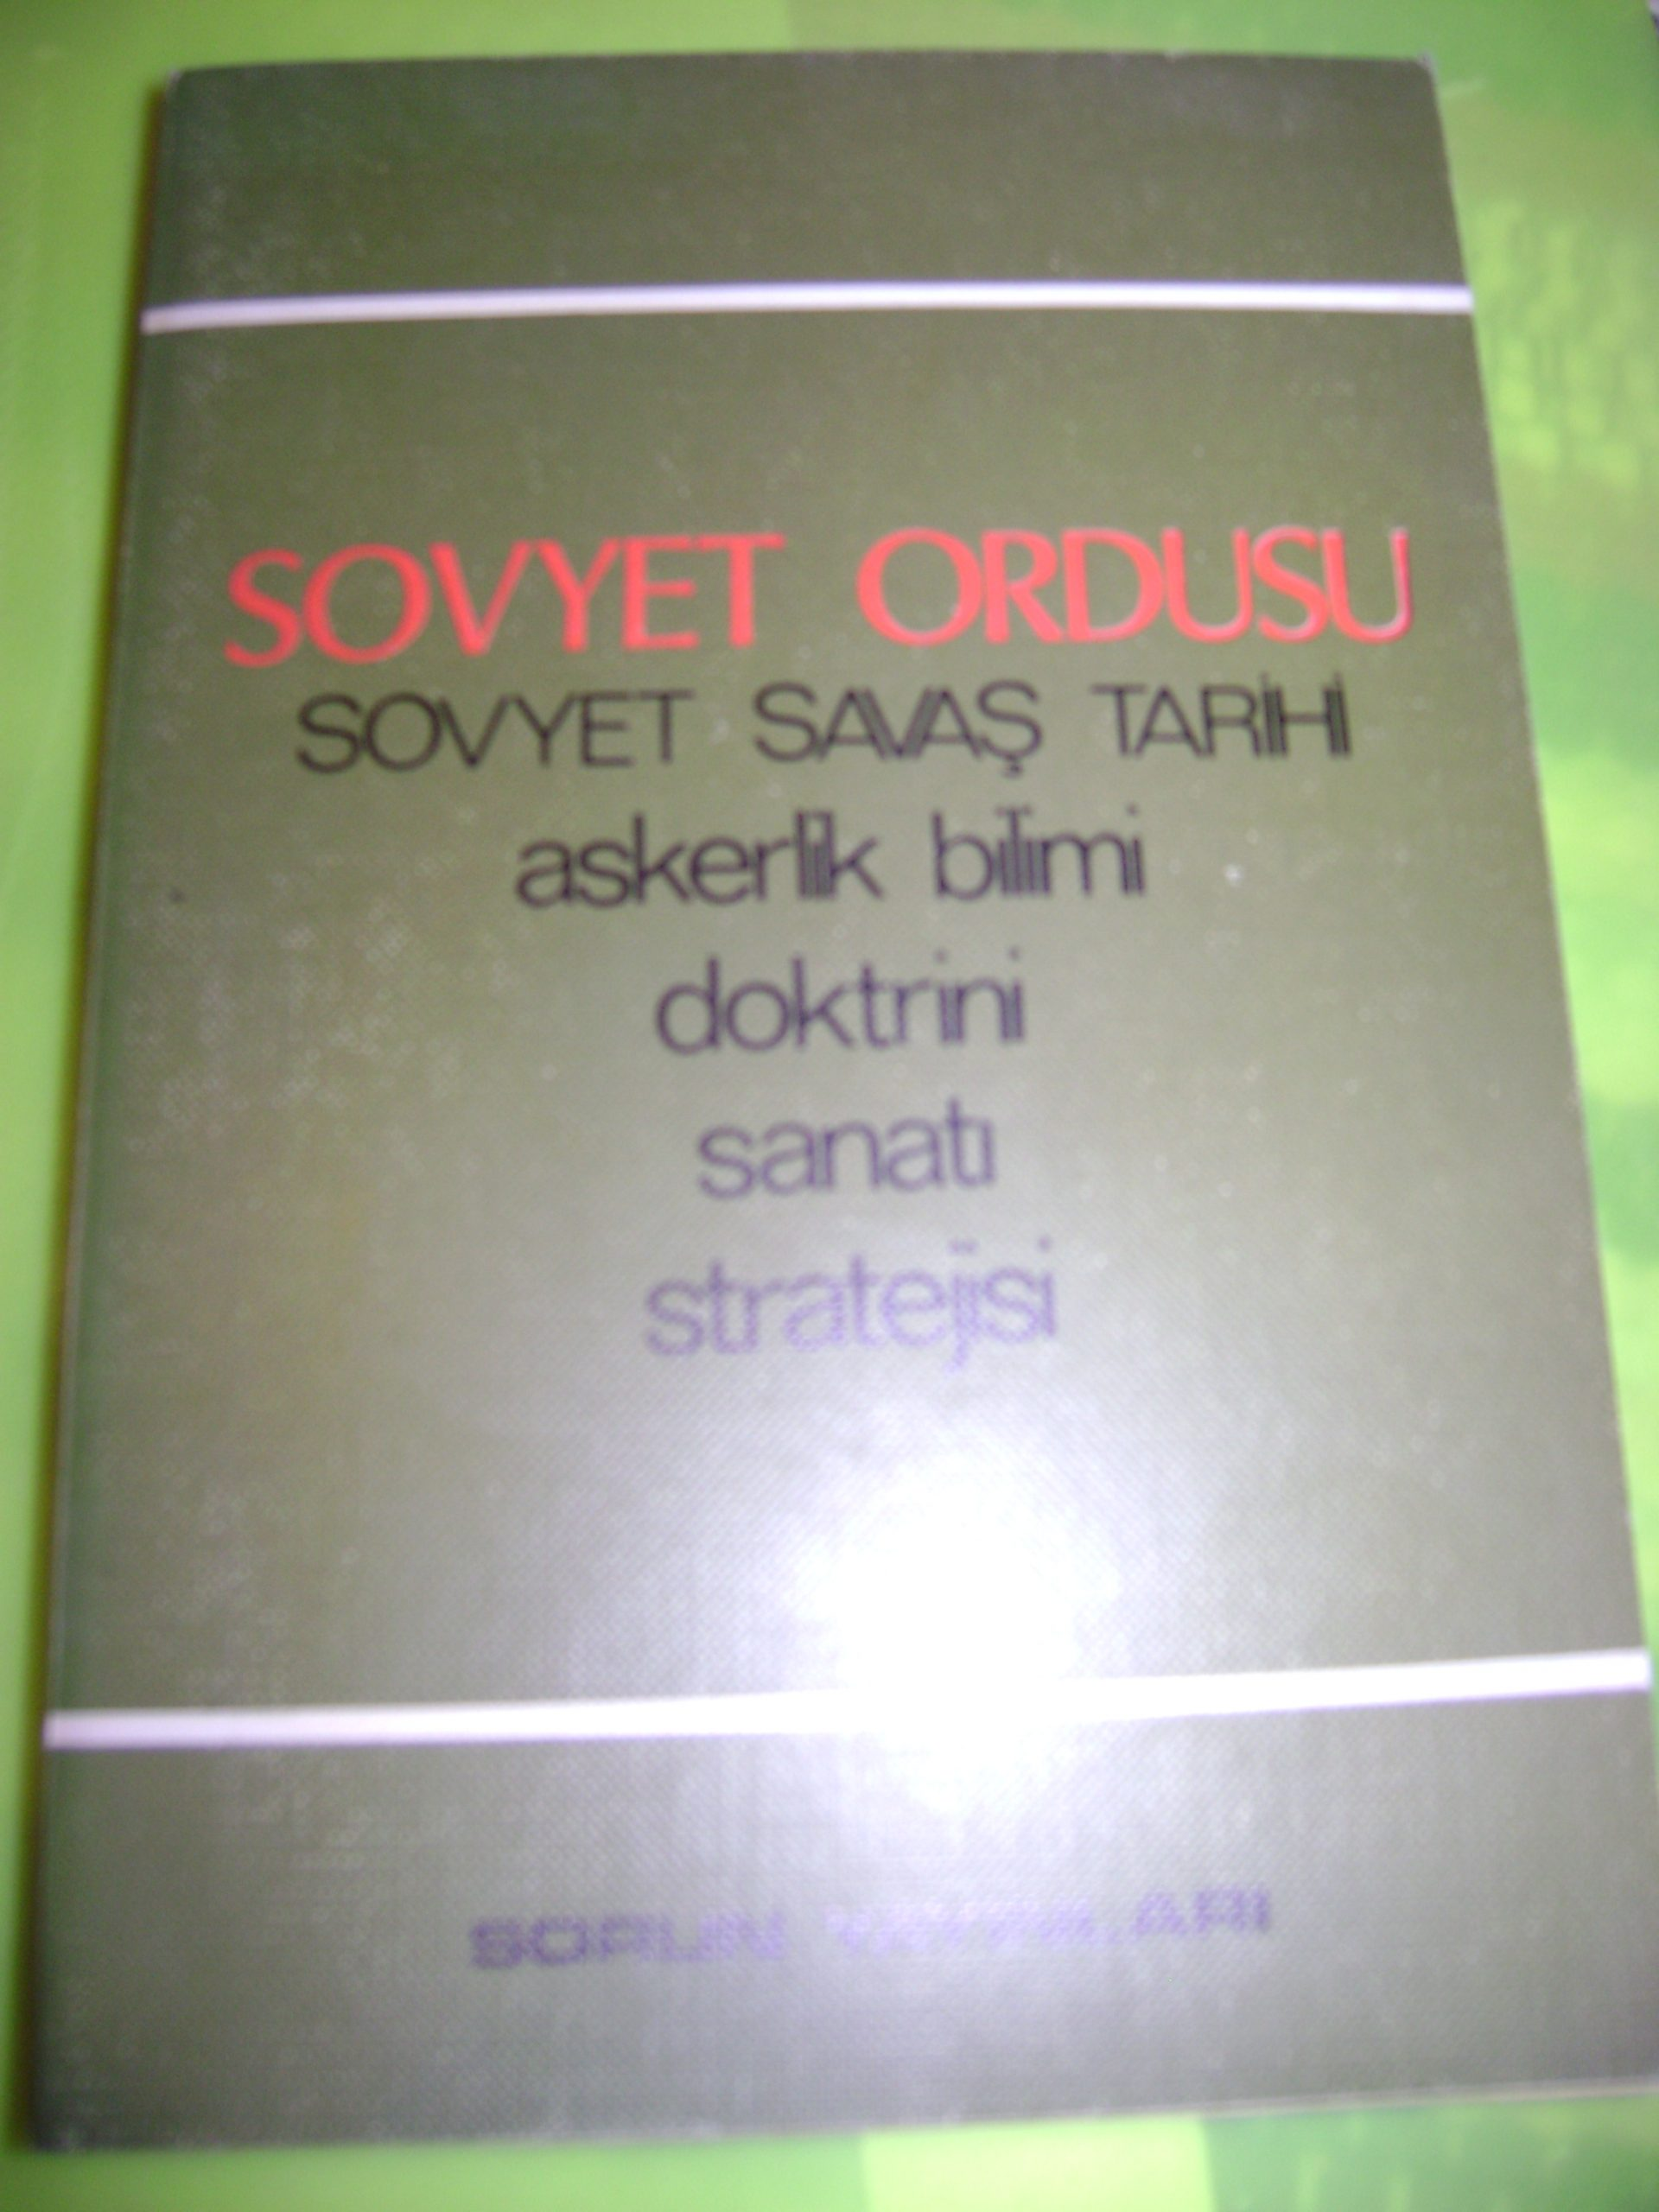 SOVYET ORDUSU/SOVYET SAVAŞ TARİHİ/Askerlik bilimi,doktrini,sanatı,stratejisi/20 tl